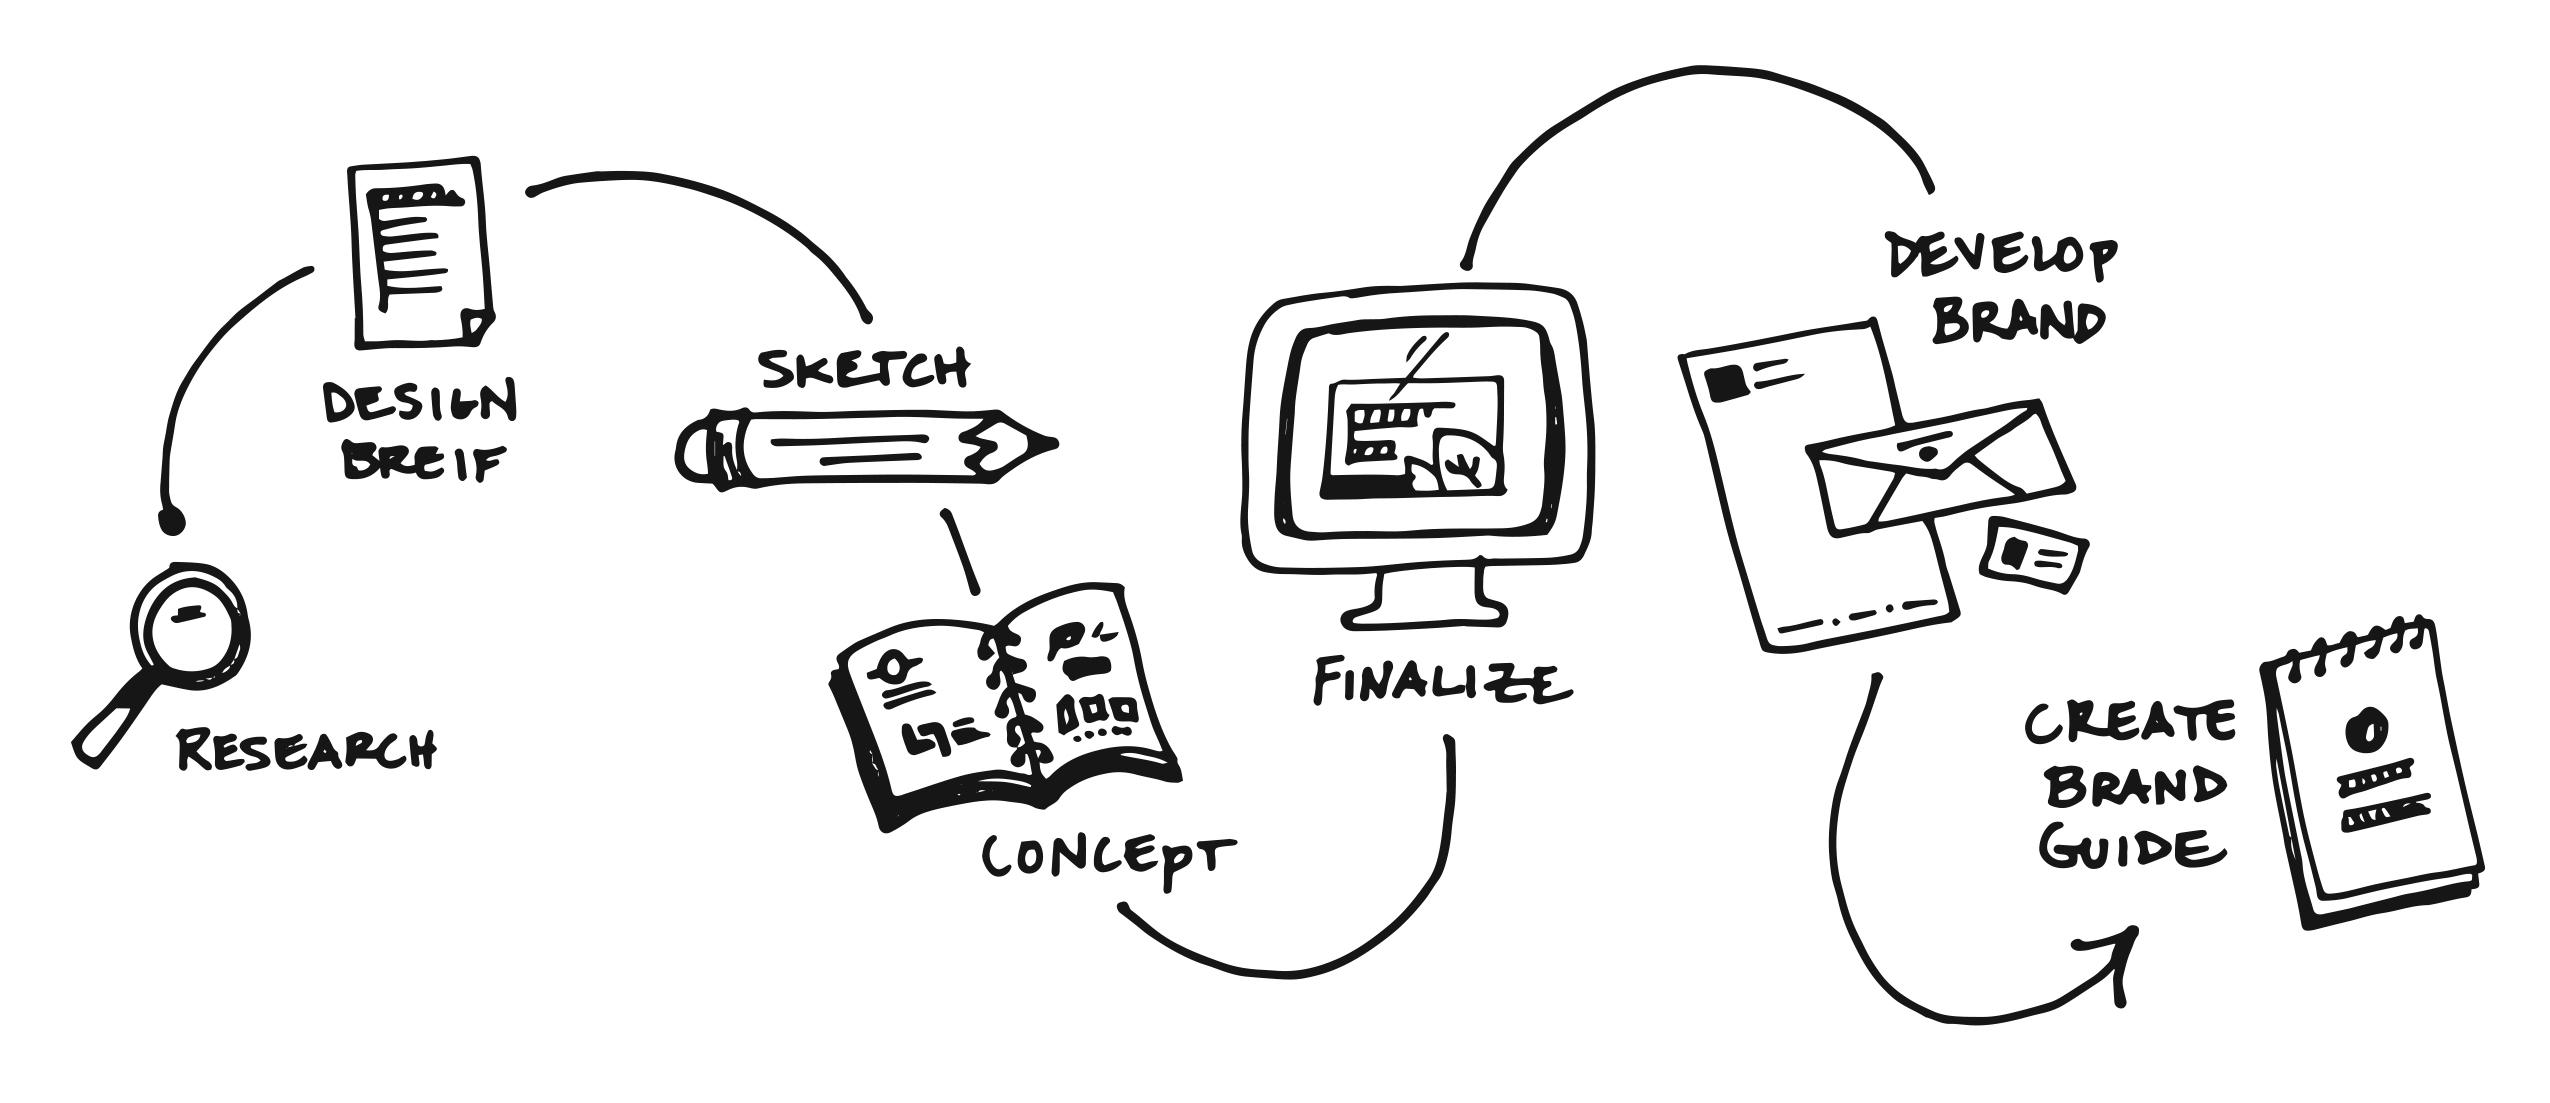 Logo_Design_Process_Brand_Guide_Creation